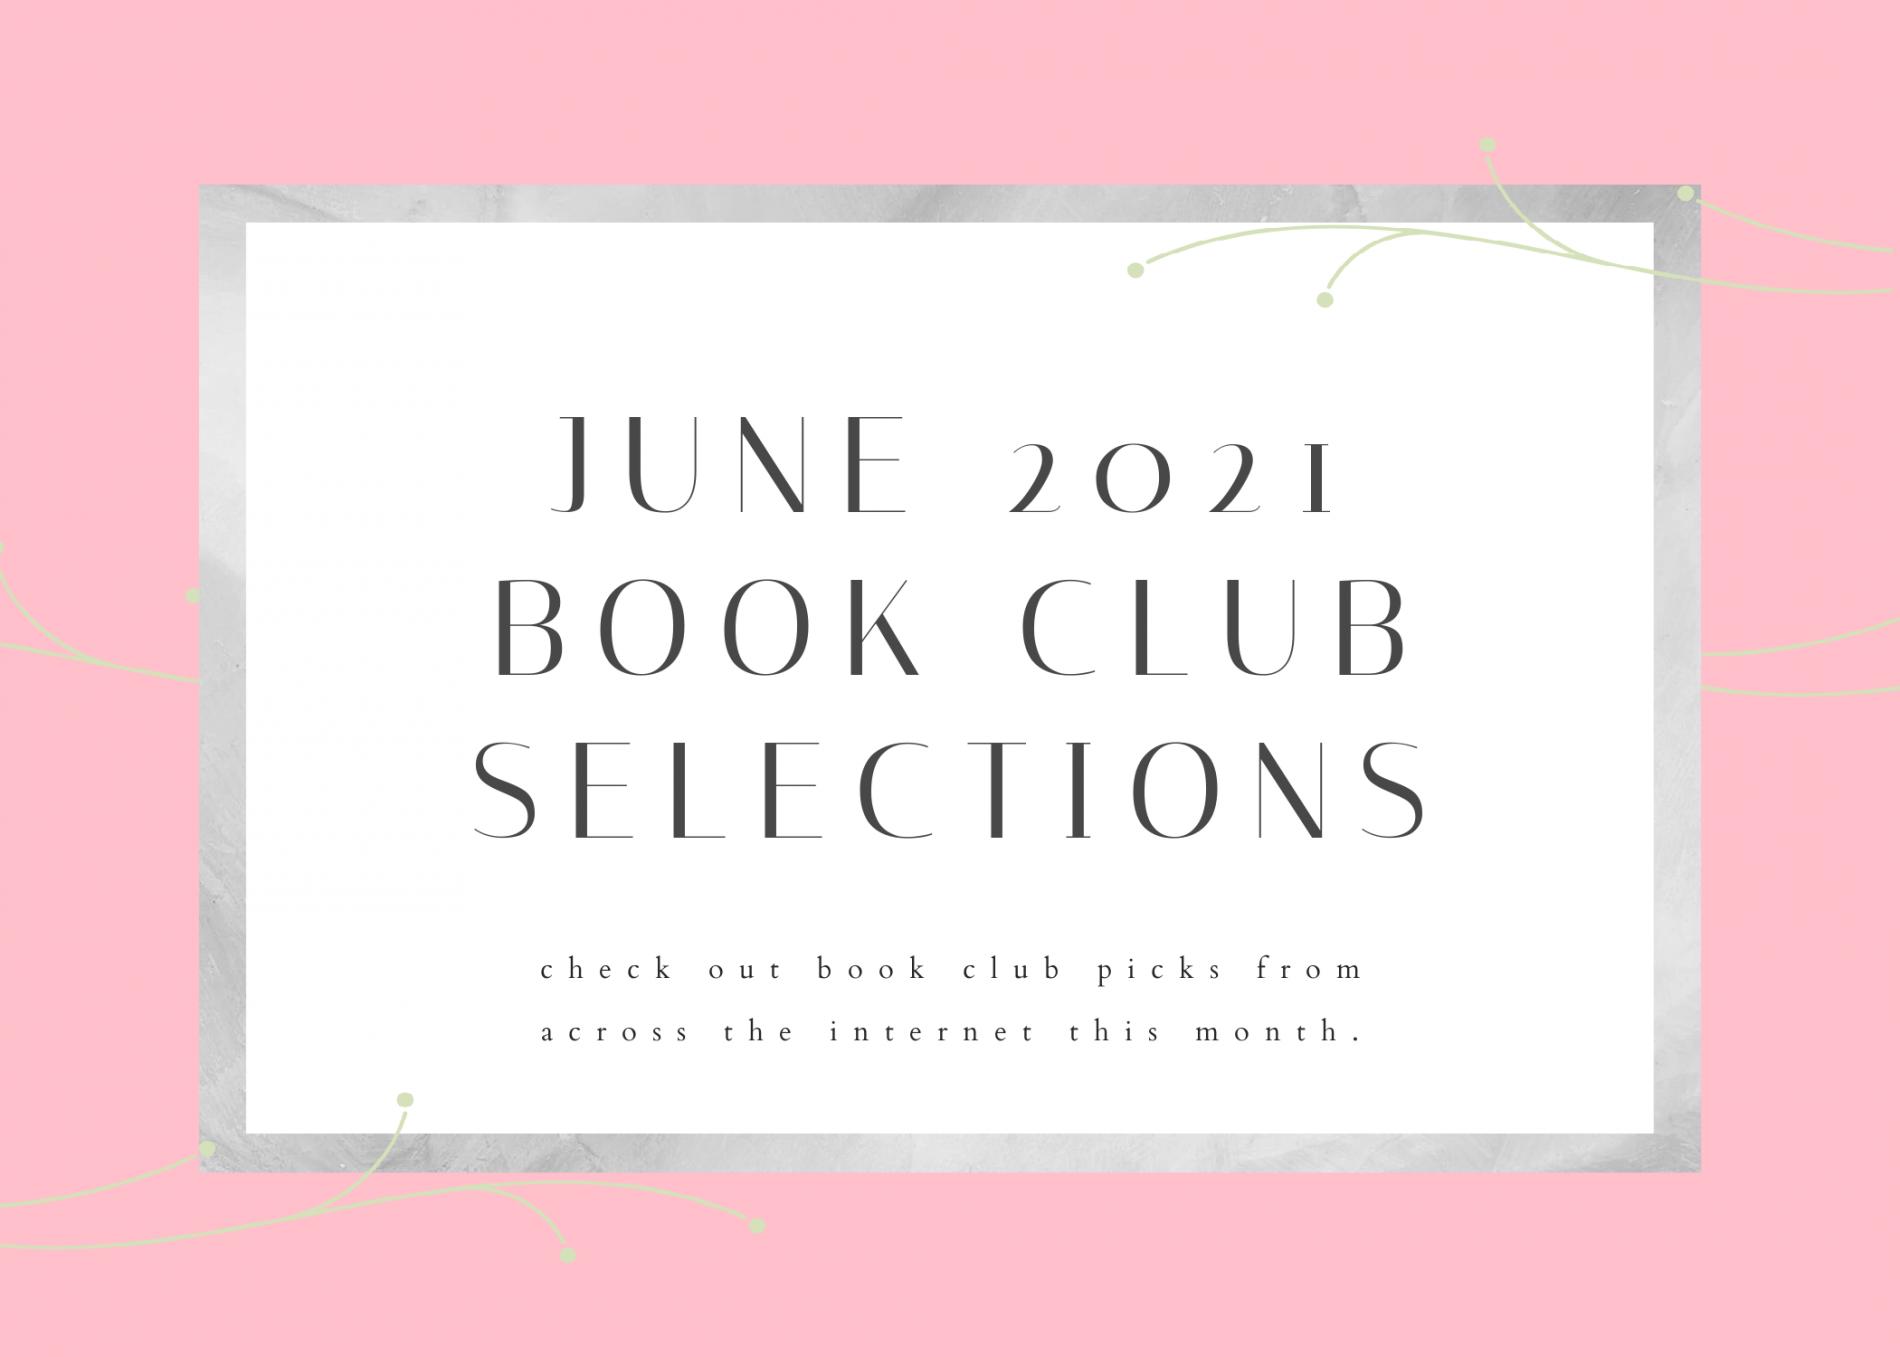 June 2021 Book Club Selections